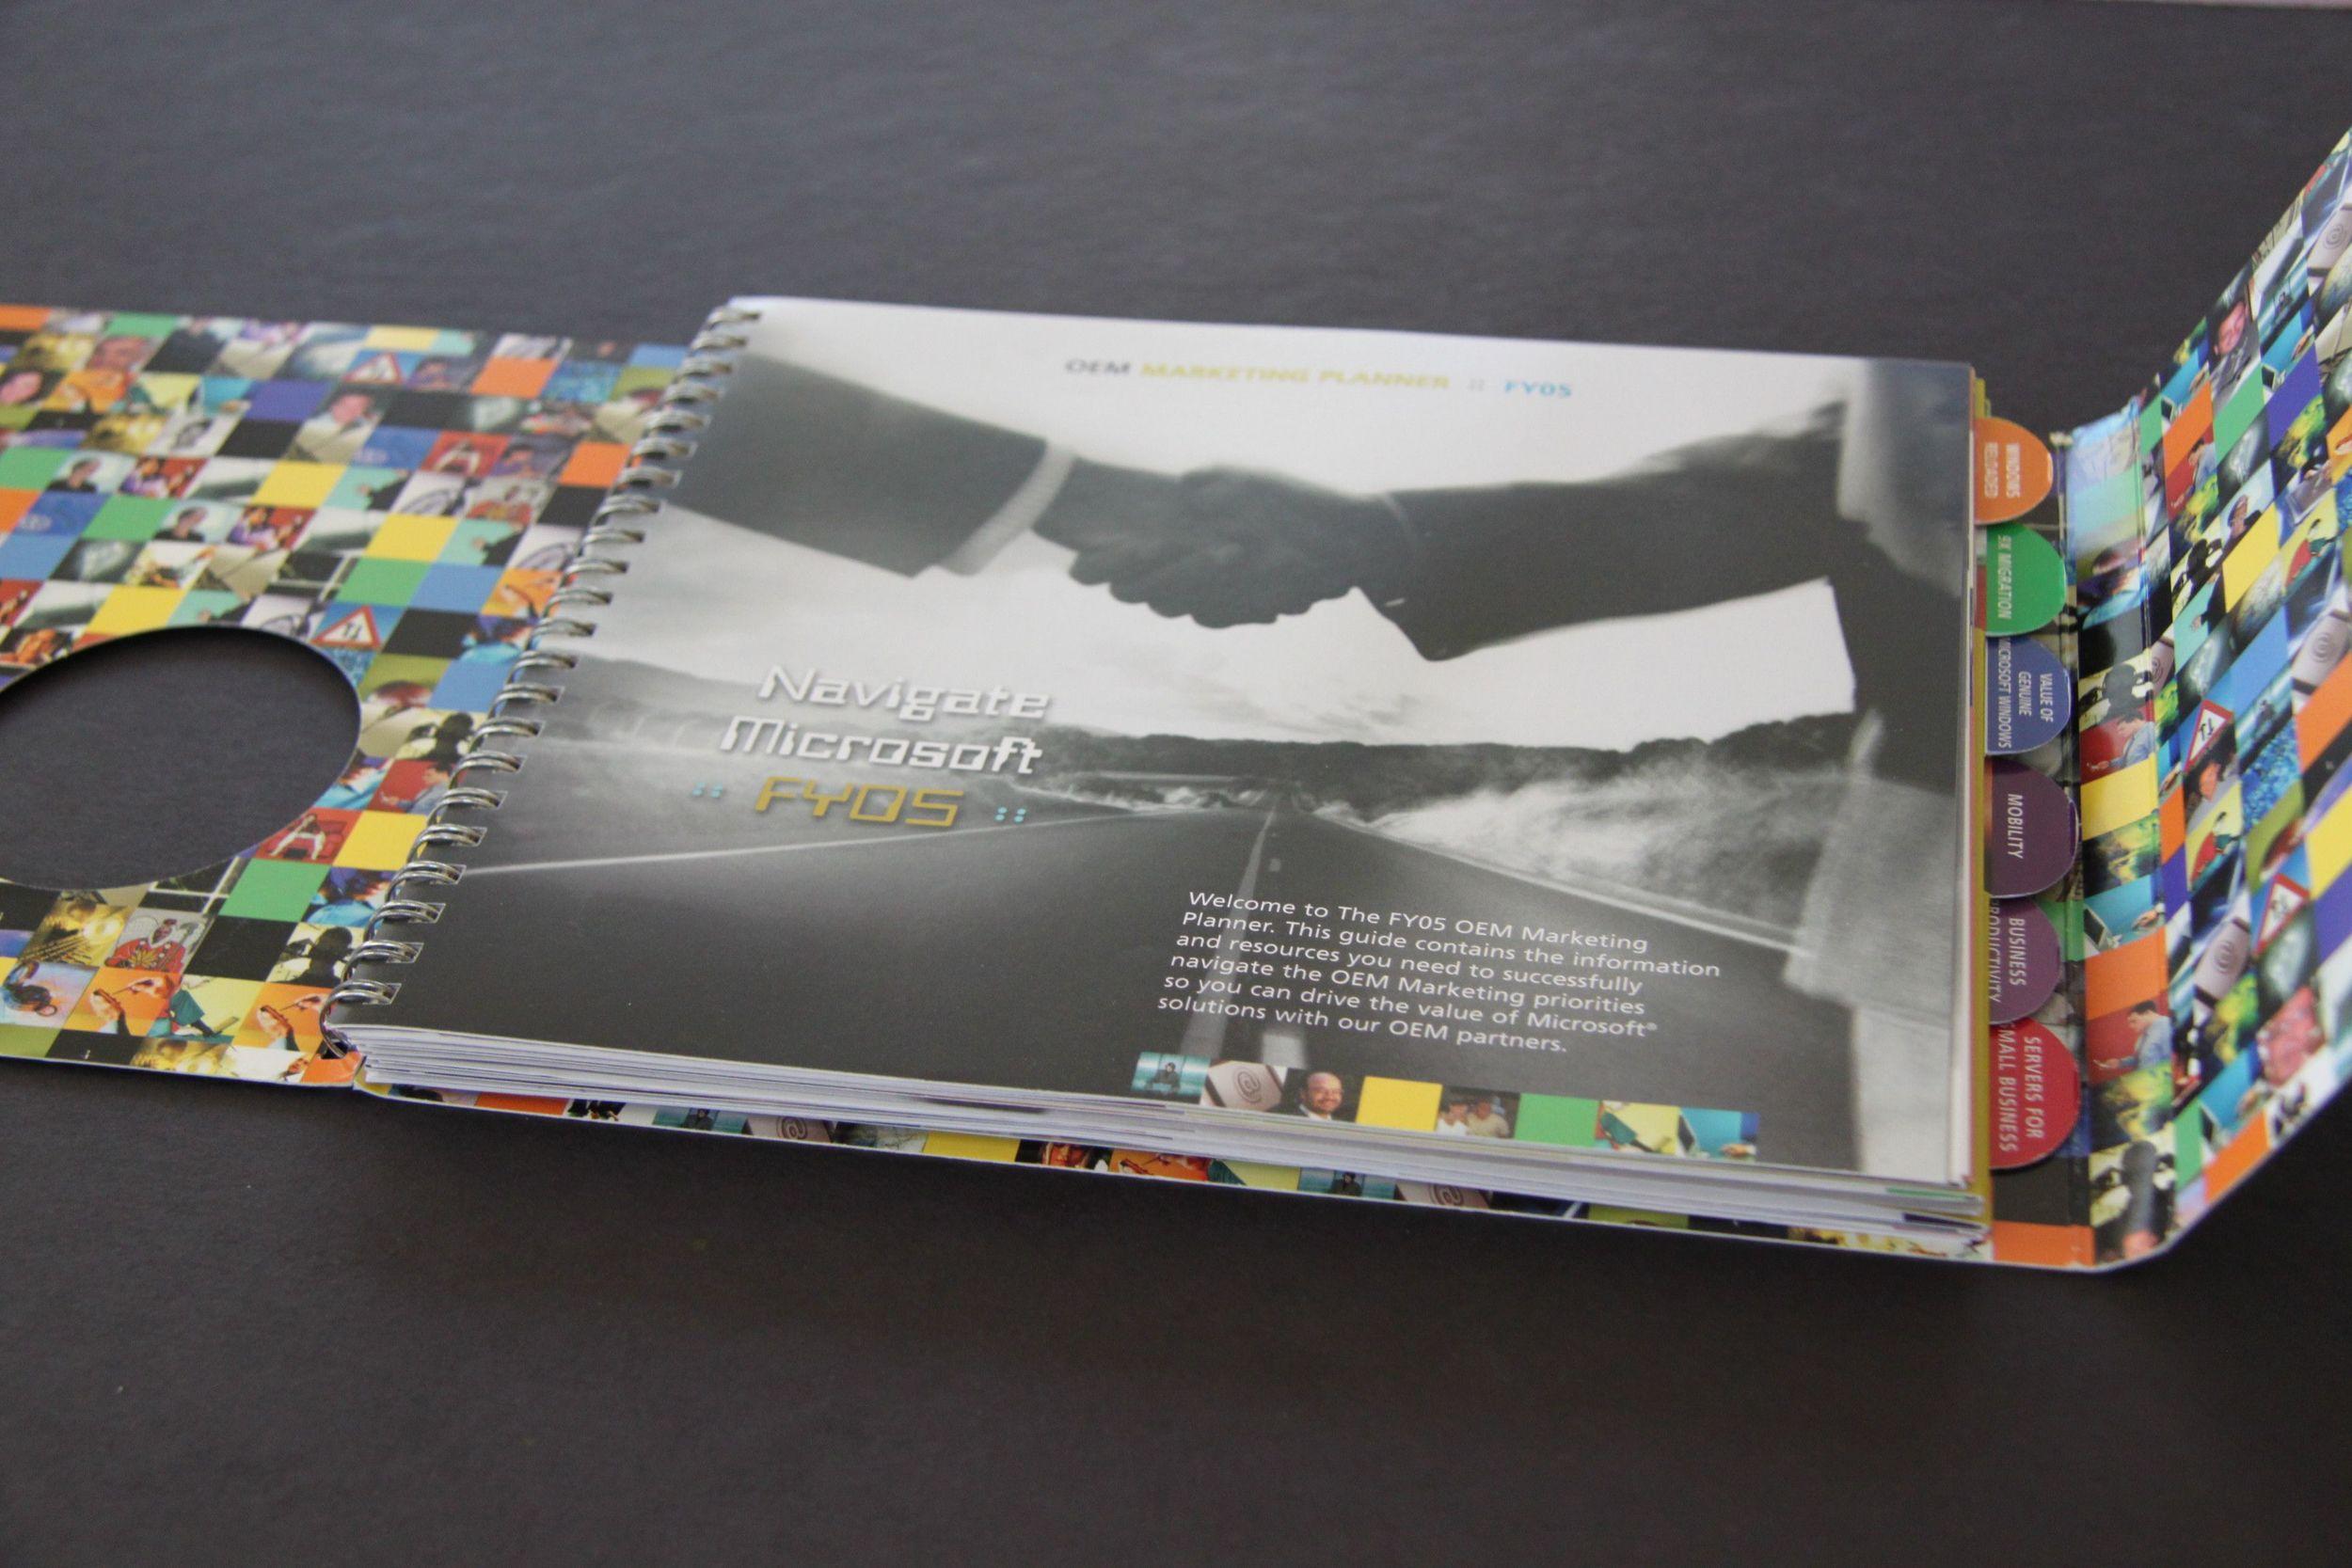 Microsoft Internal Sales Kit/Manual